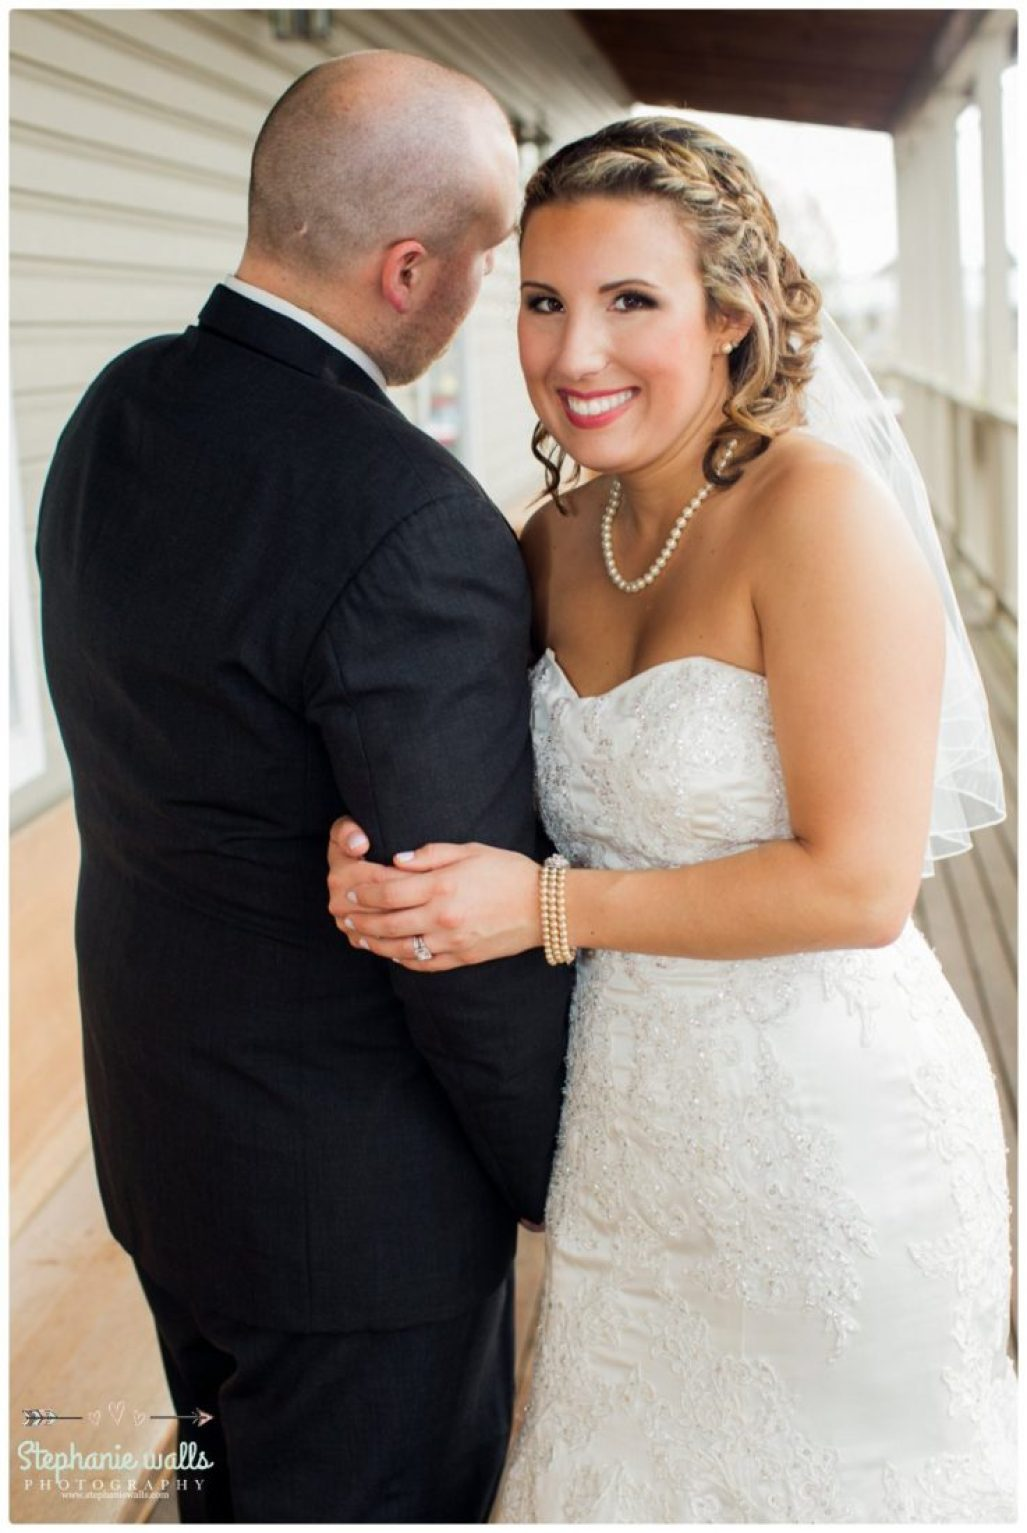 2016 03 21 0001 Racing Love   Snohomish Event Center   Snohomish Wedding Photographer